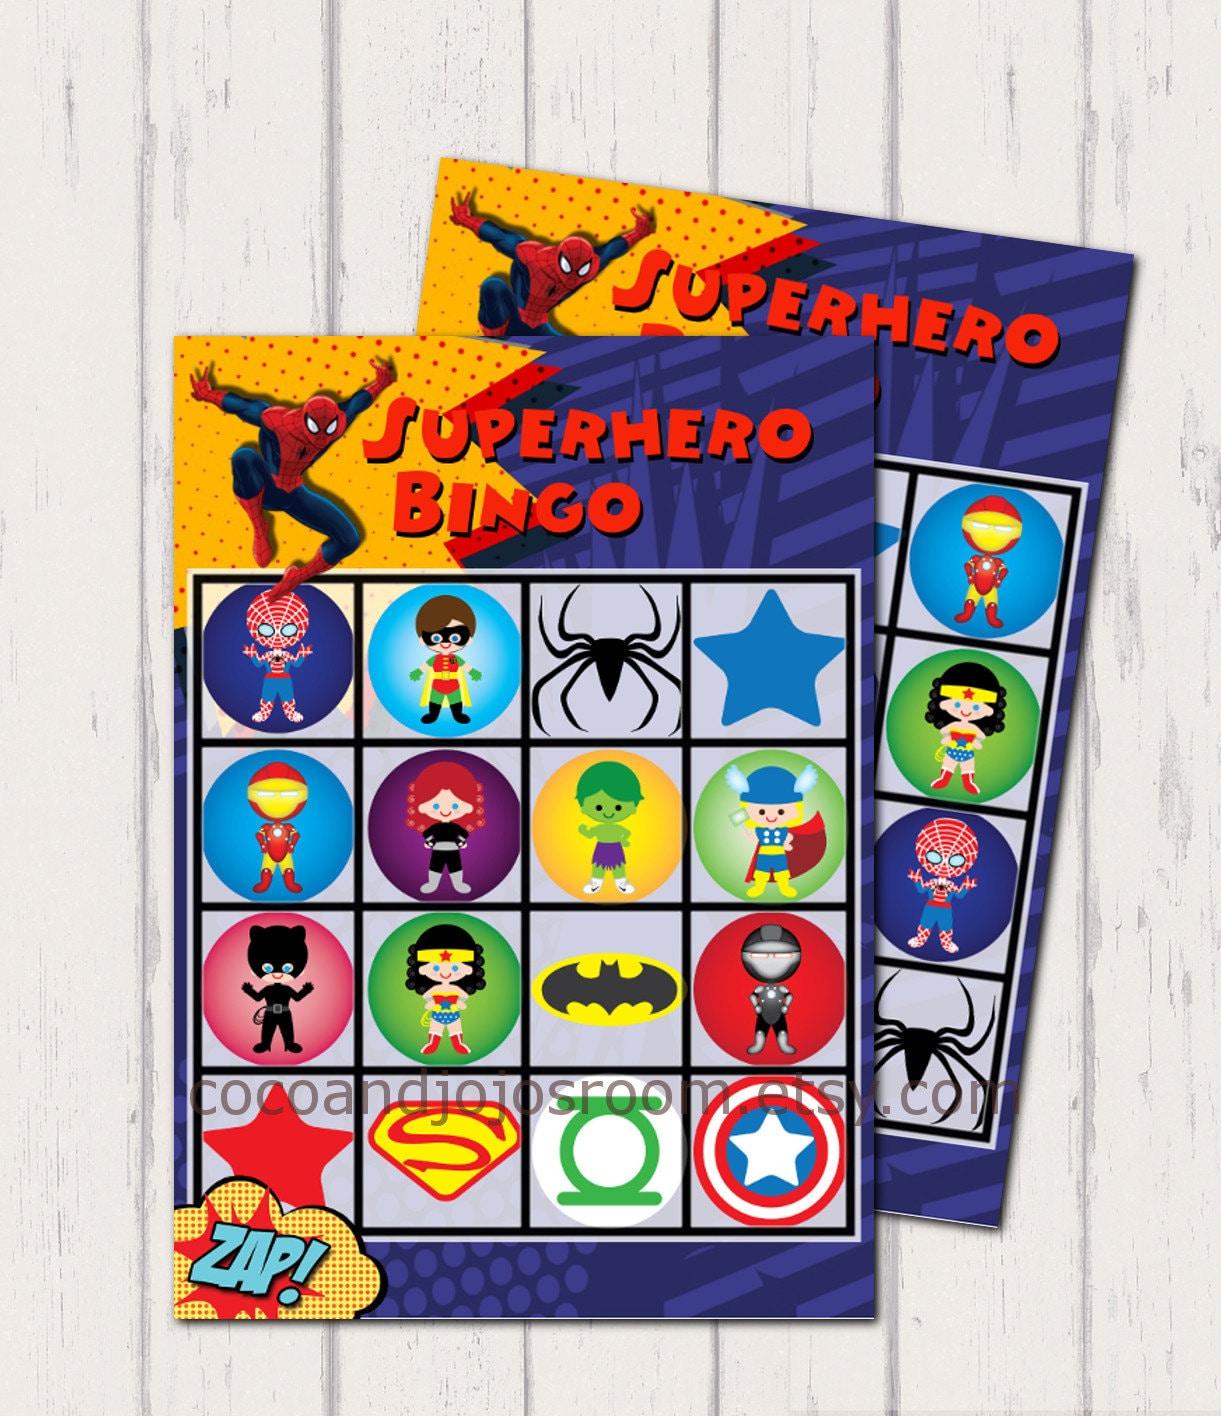 20 Superhero Bingo Cards Printable Instant By Cocoandjojosroom